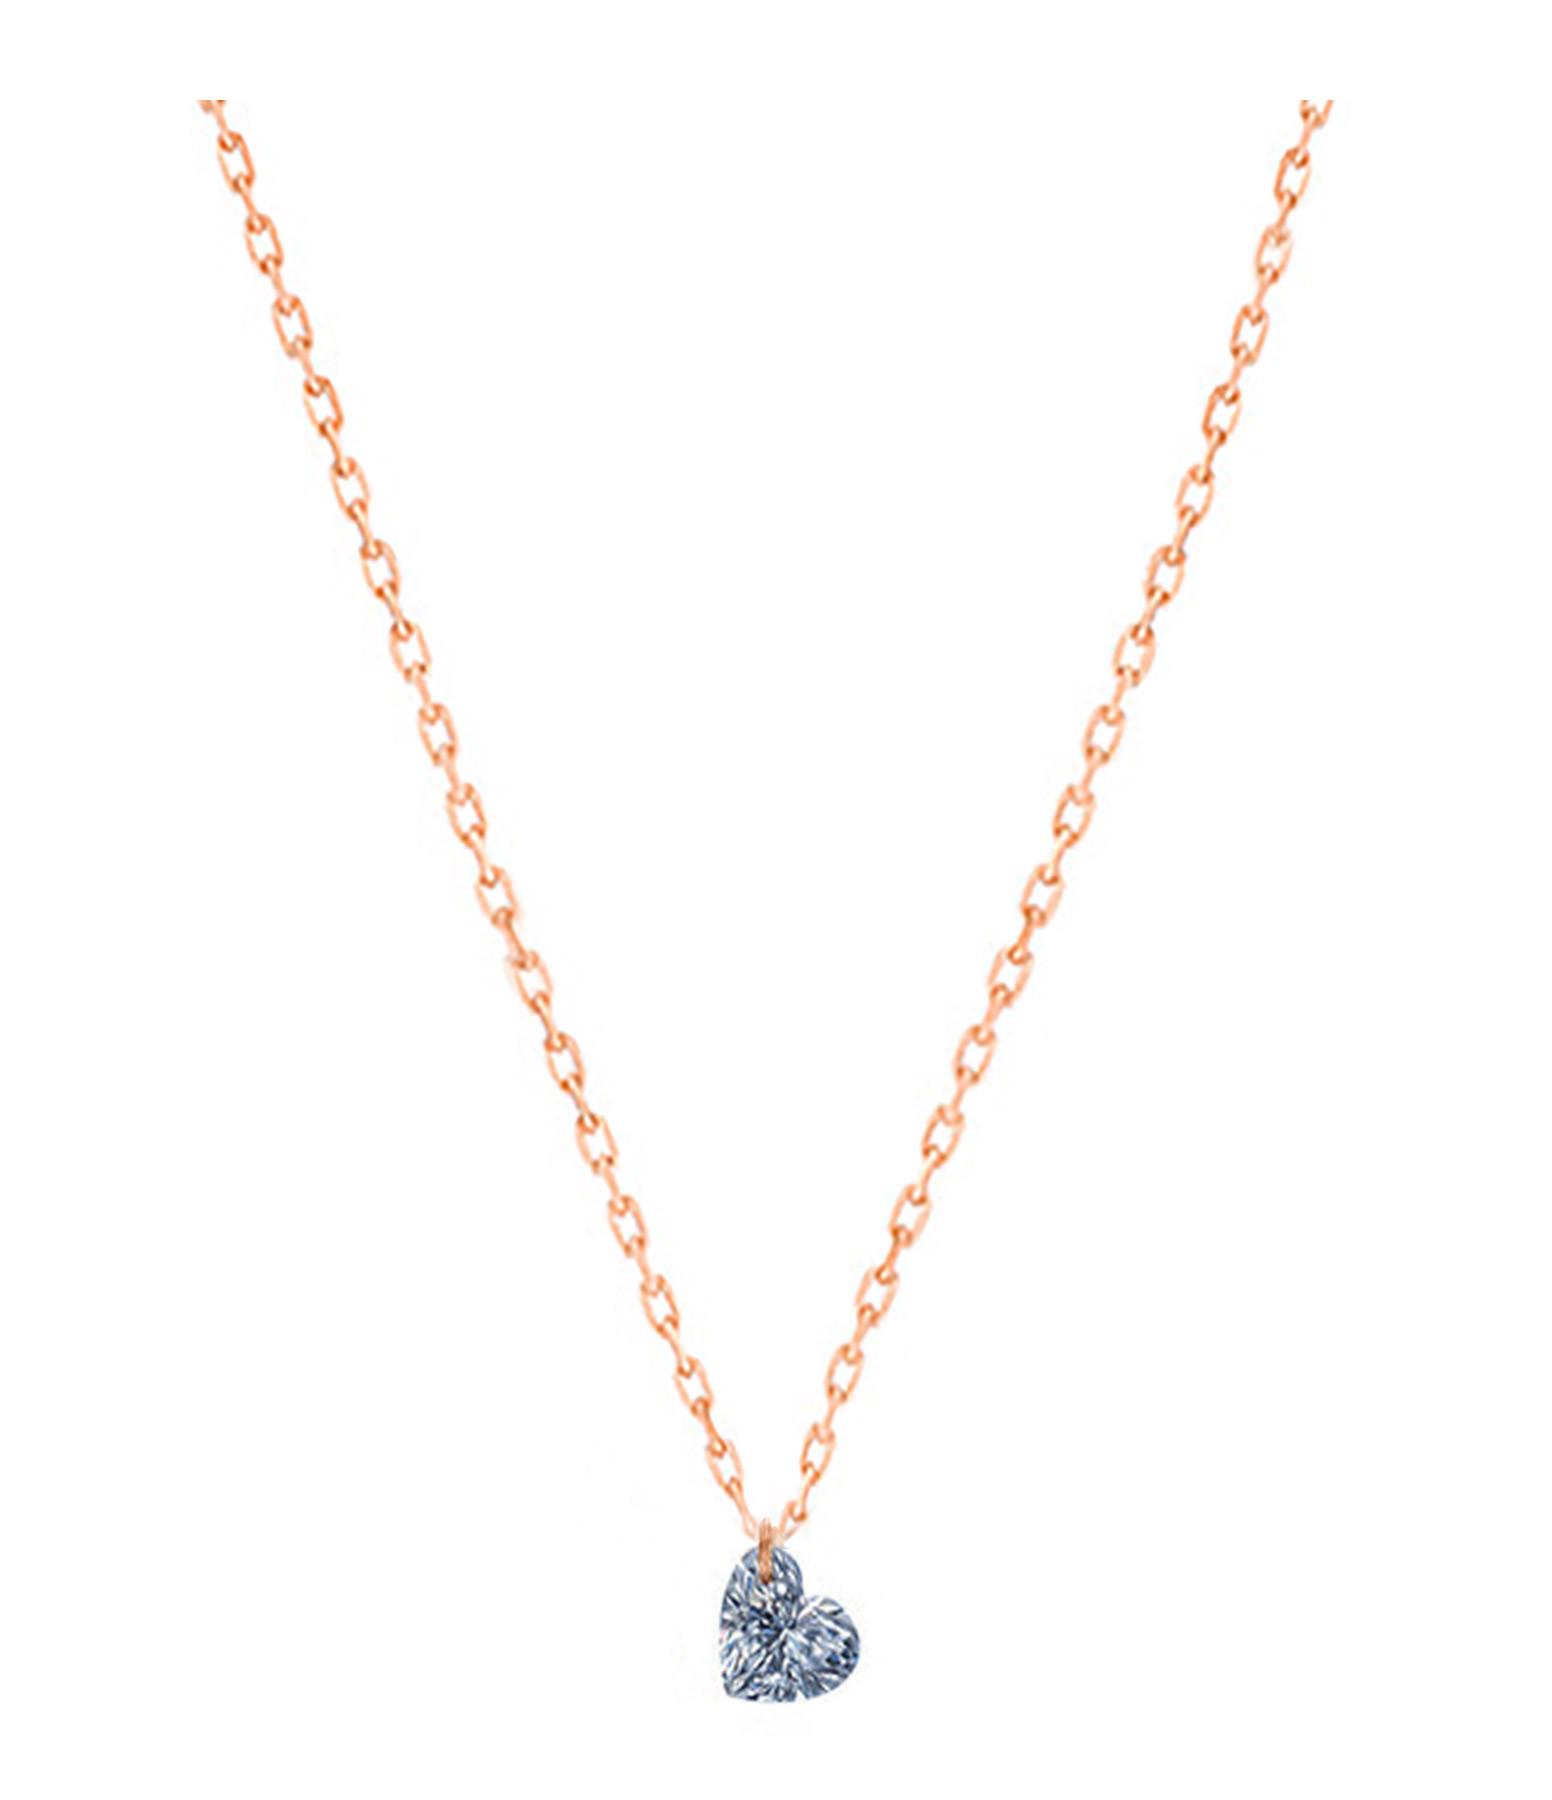 LA BRUNE & LA BLONDE - Collier 360° Cœur Diamant 0,15 Or Rose